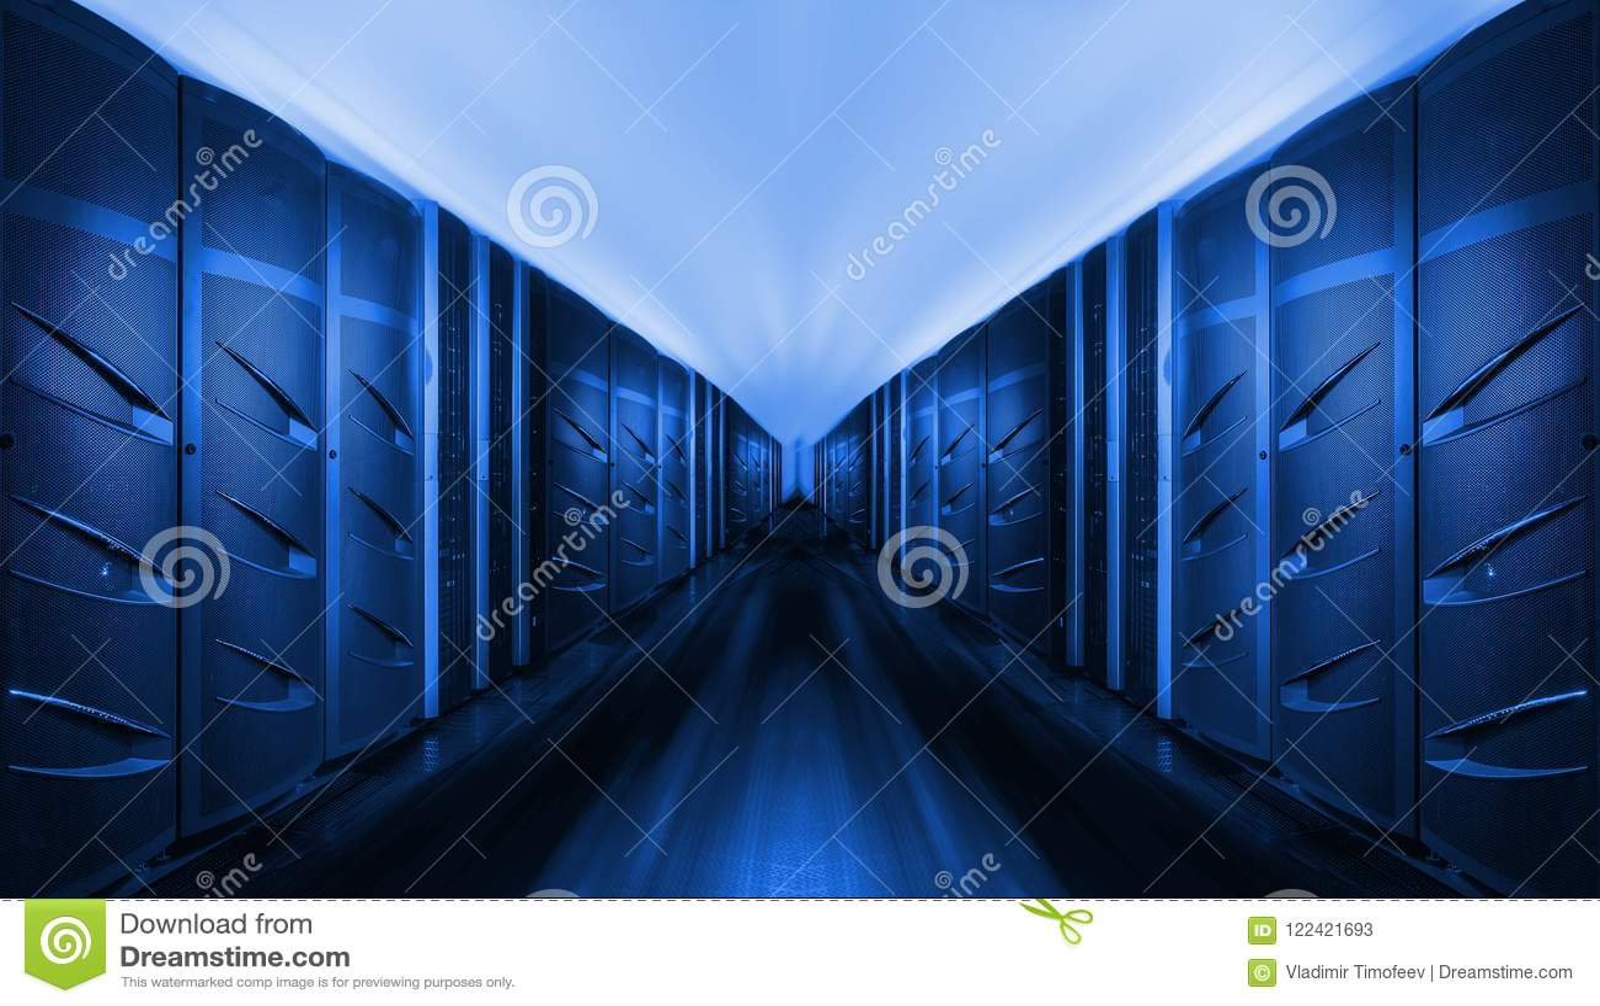 Network and internet communication technology concept, data center interior, server racks with telecommunication